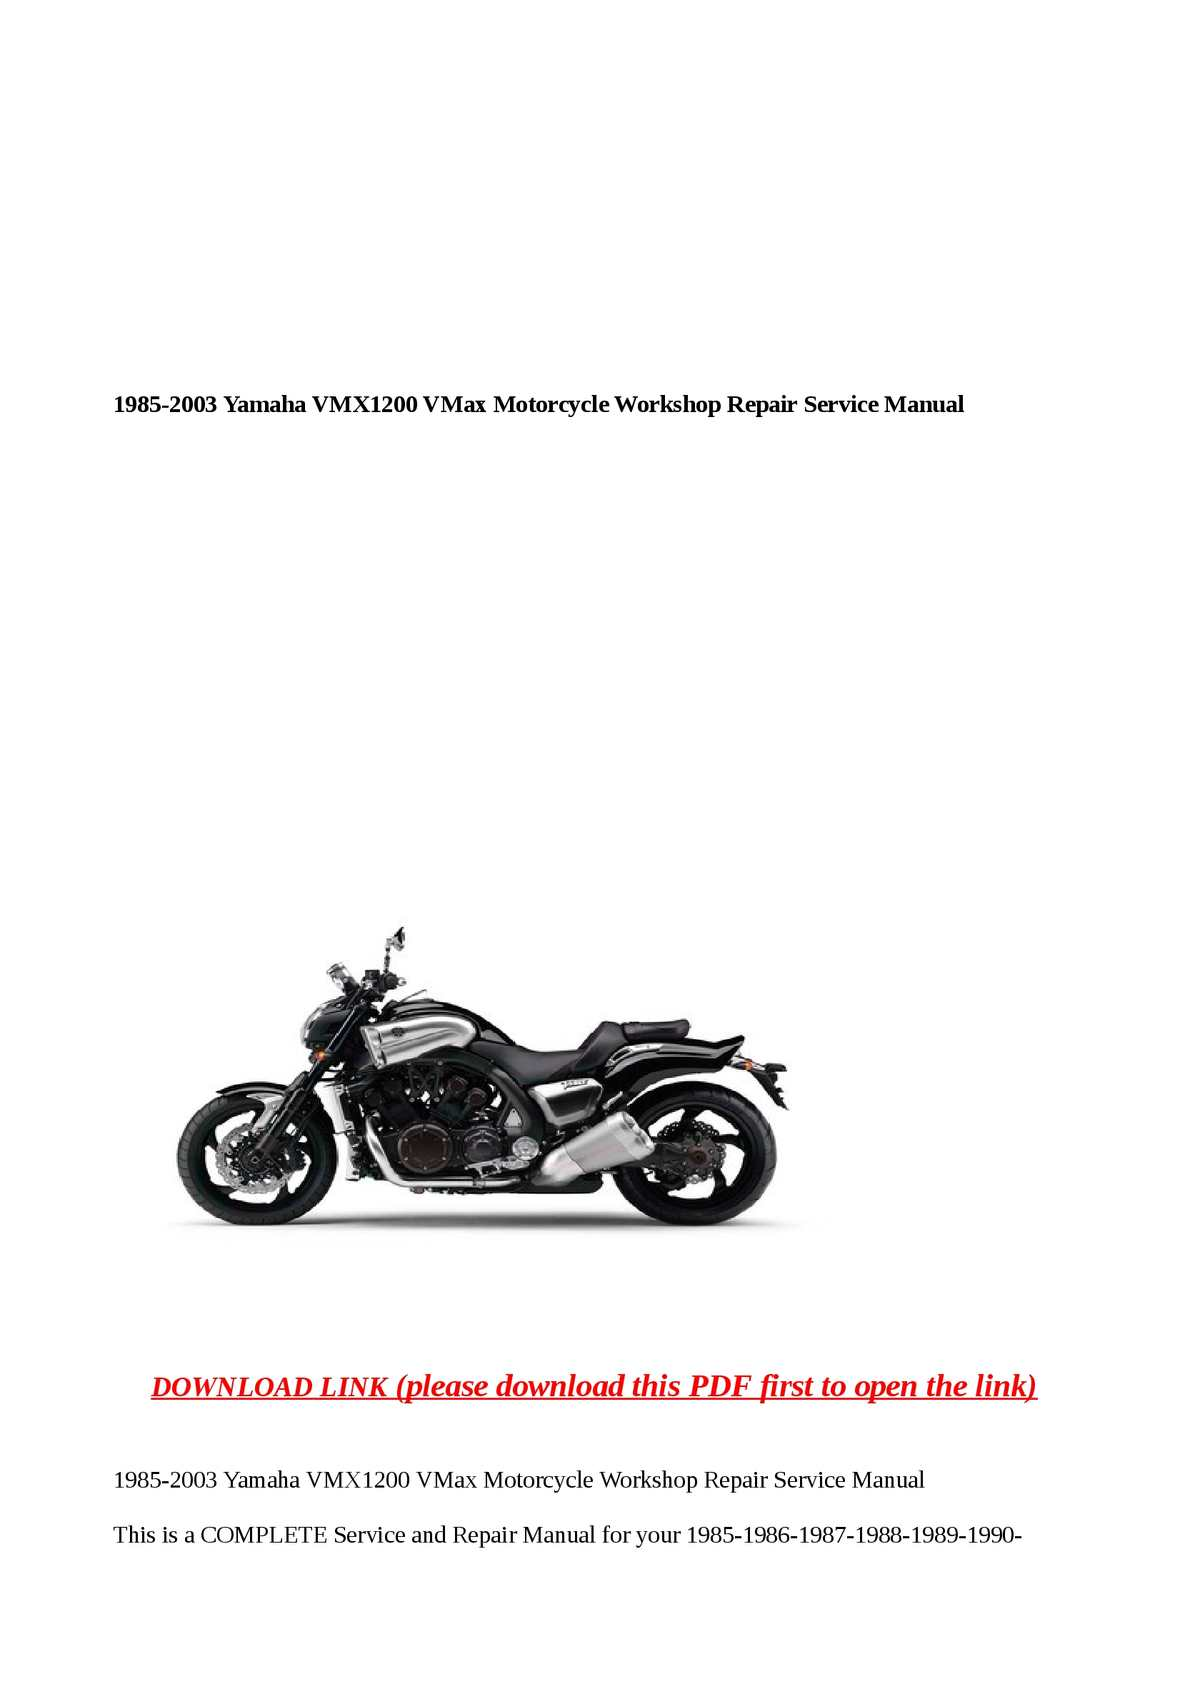 Calaméo - 1985-2003 Yamaha VMX1200 VMax Motorcycle Workshop Rep on